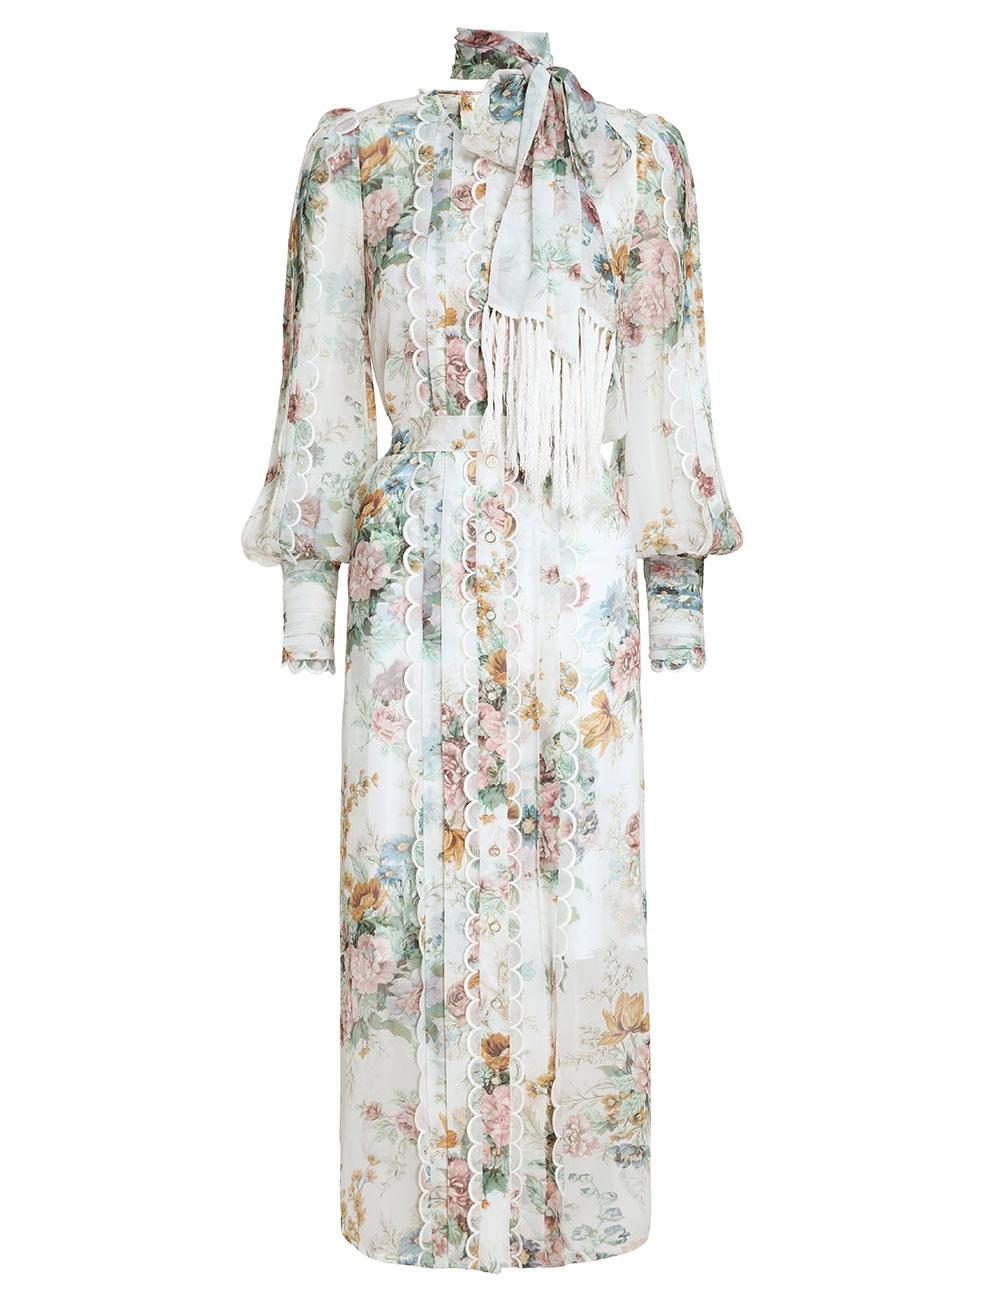 Wavelength Scallop Midi Dress